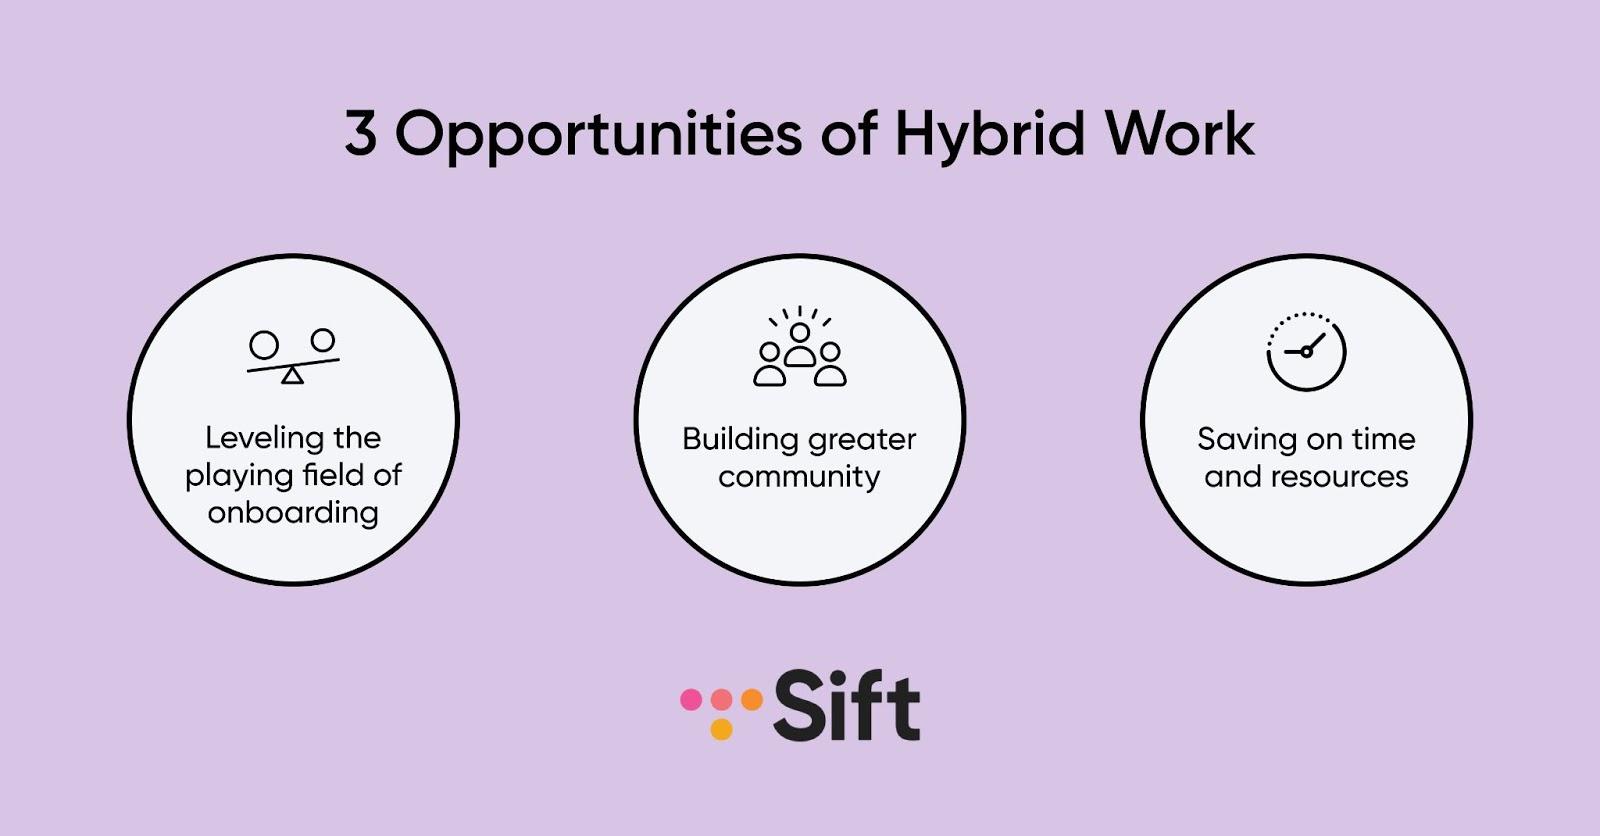 Opportunities of hybrid work